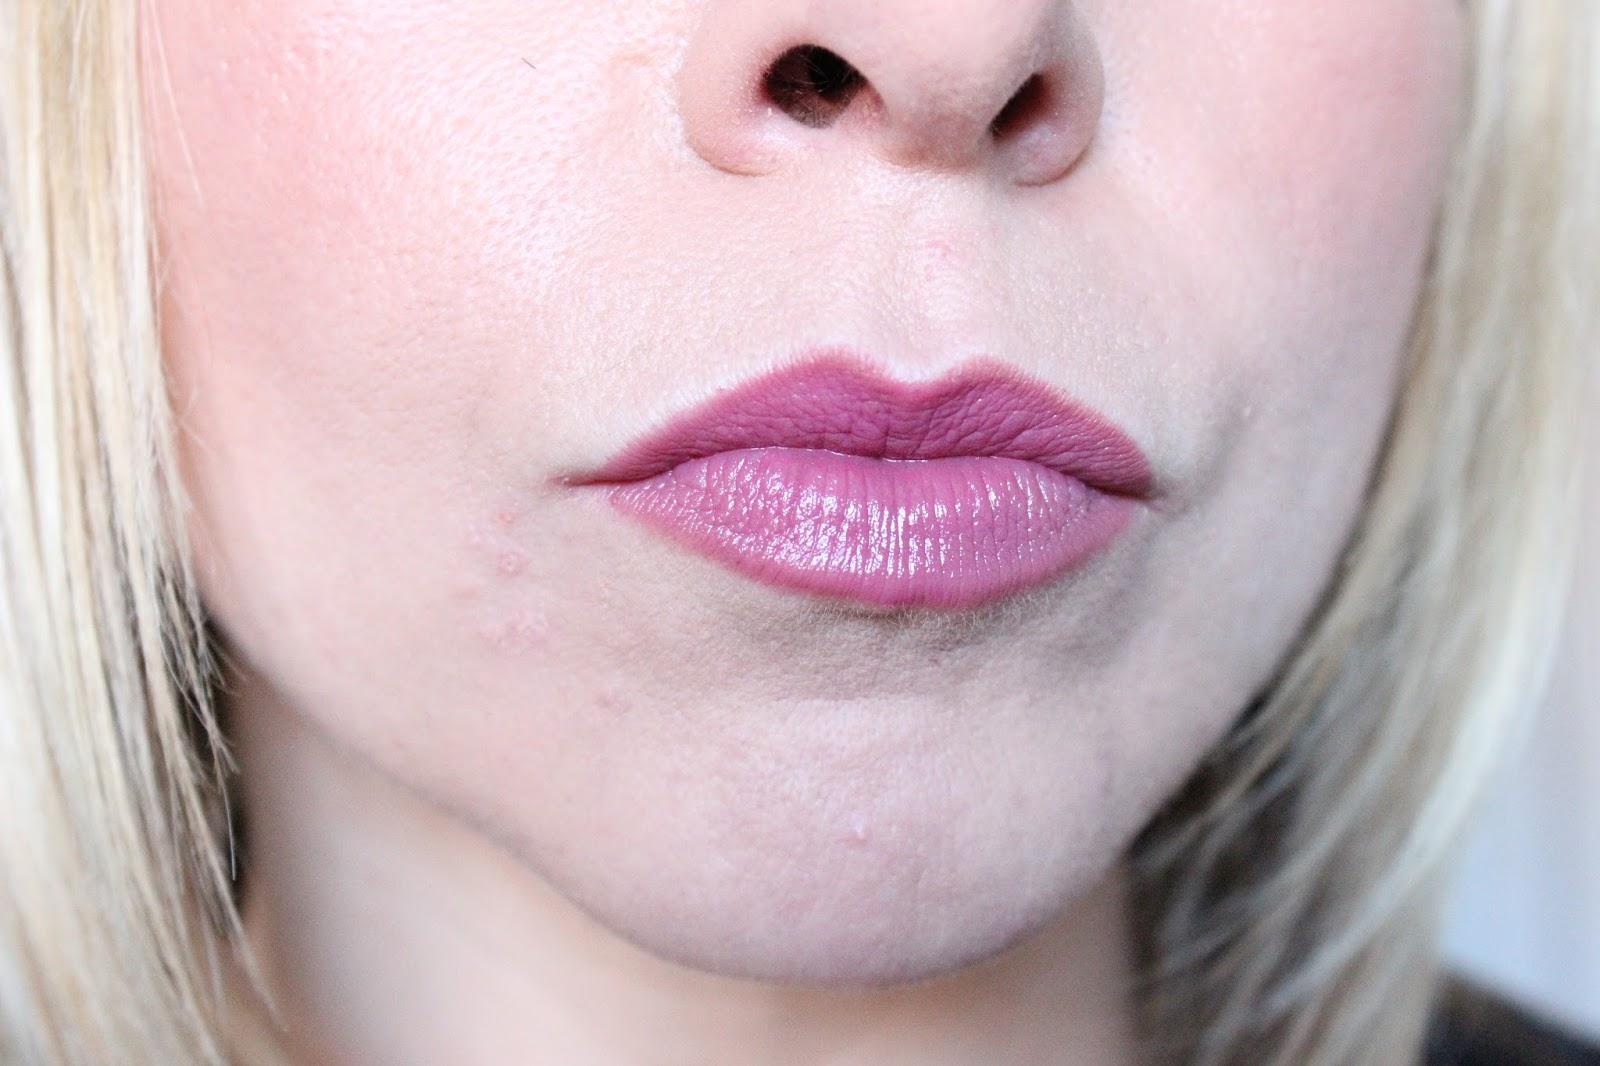 Mac Plumful Lipstick and Mac Soar Lip Liner